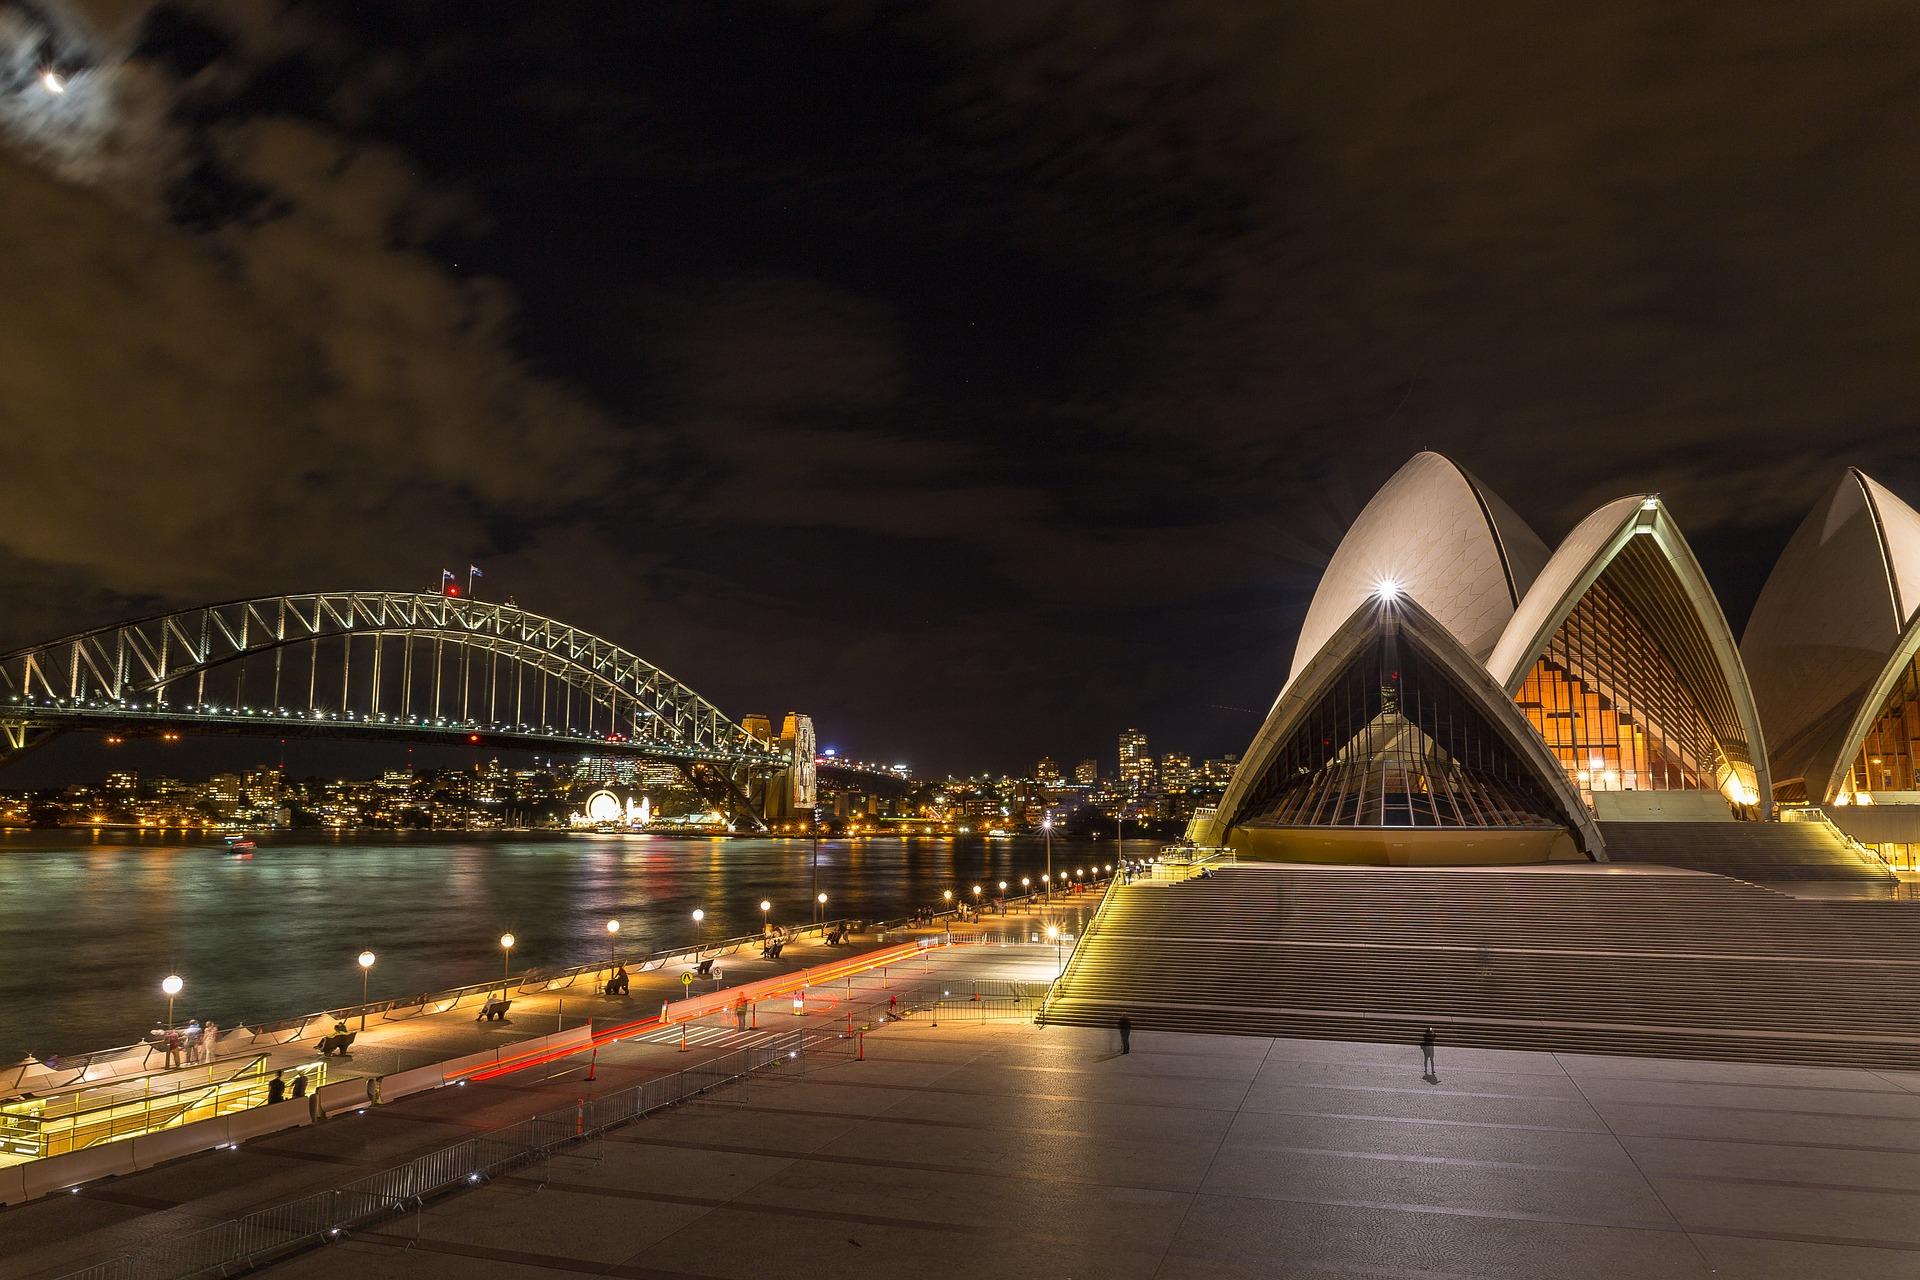 Sydney Harbour Bridge with Sysdney Opera House, Australia